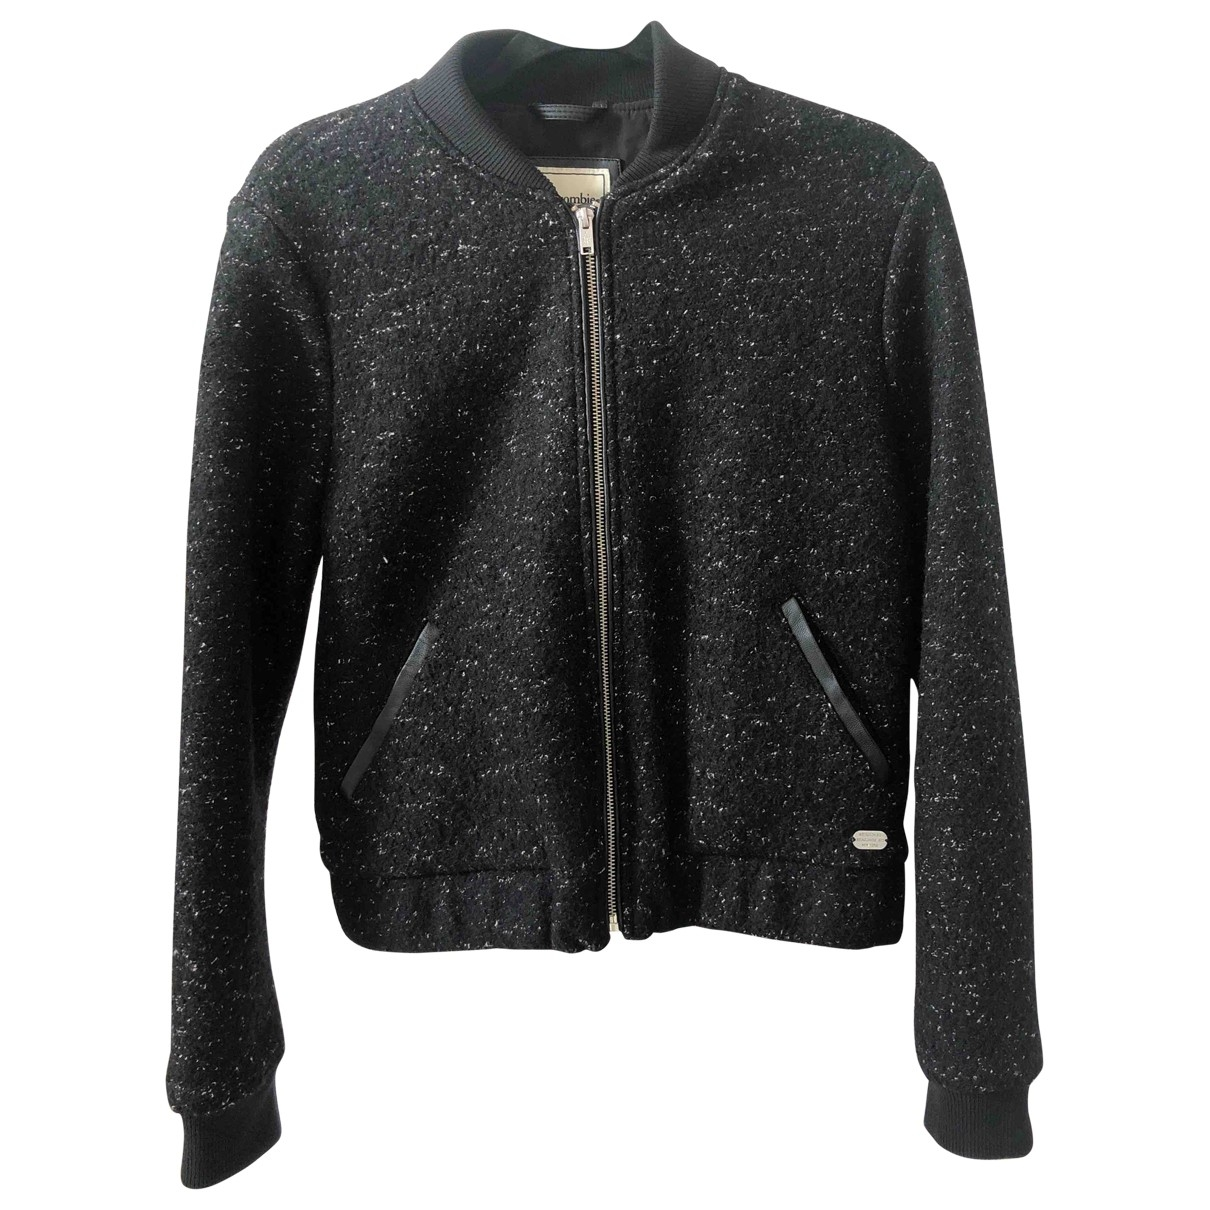 Abercrombie & Fitch \N Black Wool jacket for Women 14 UK